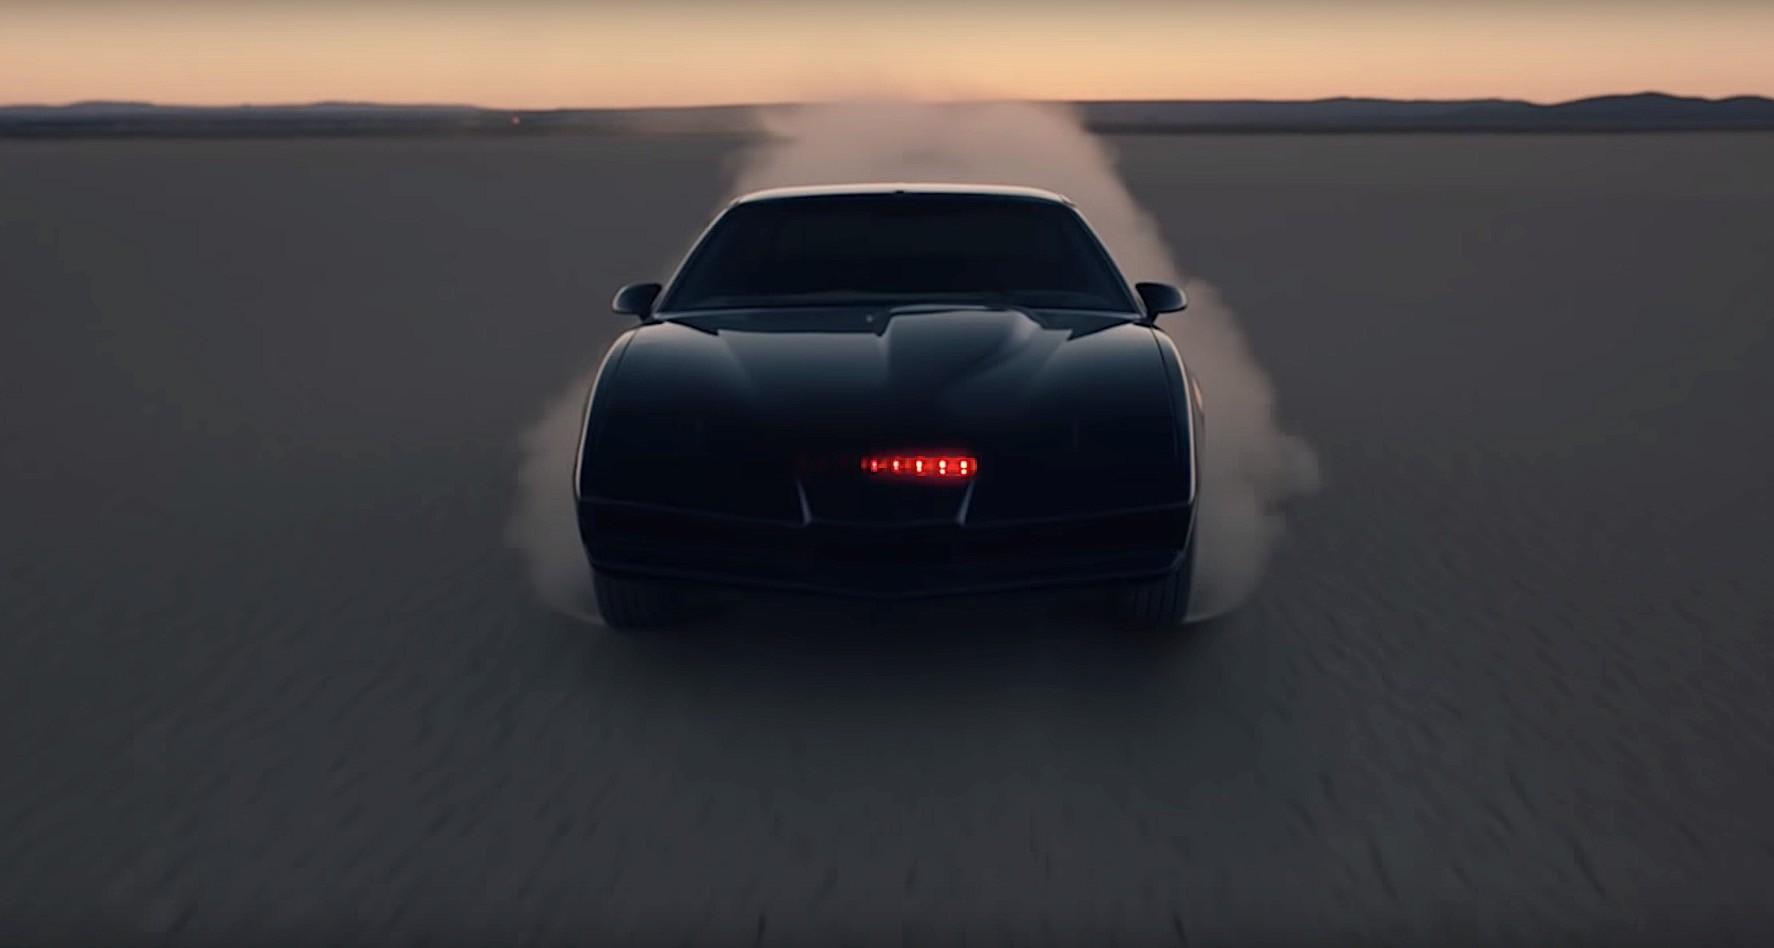 Garmin nuvi GPS with Knight Rider Voice - autoevolution